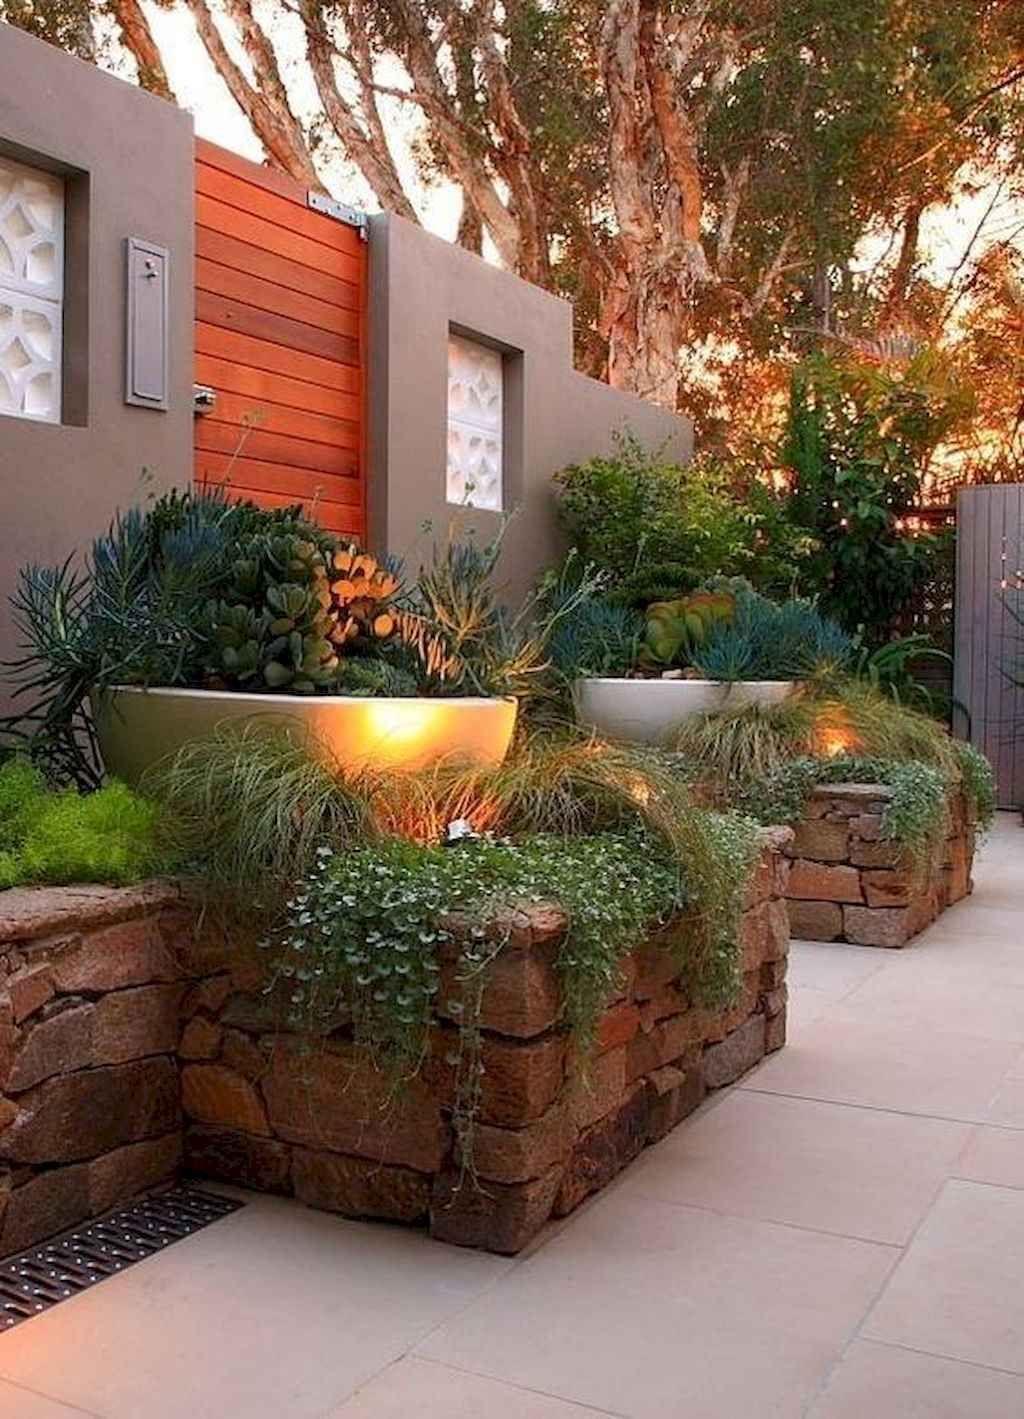 Flower Garden Ideas Small Backyard Landscaping Succulent Landscape Design Privacy Landscaping Backyard Garden backyard and landscape ideas